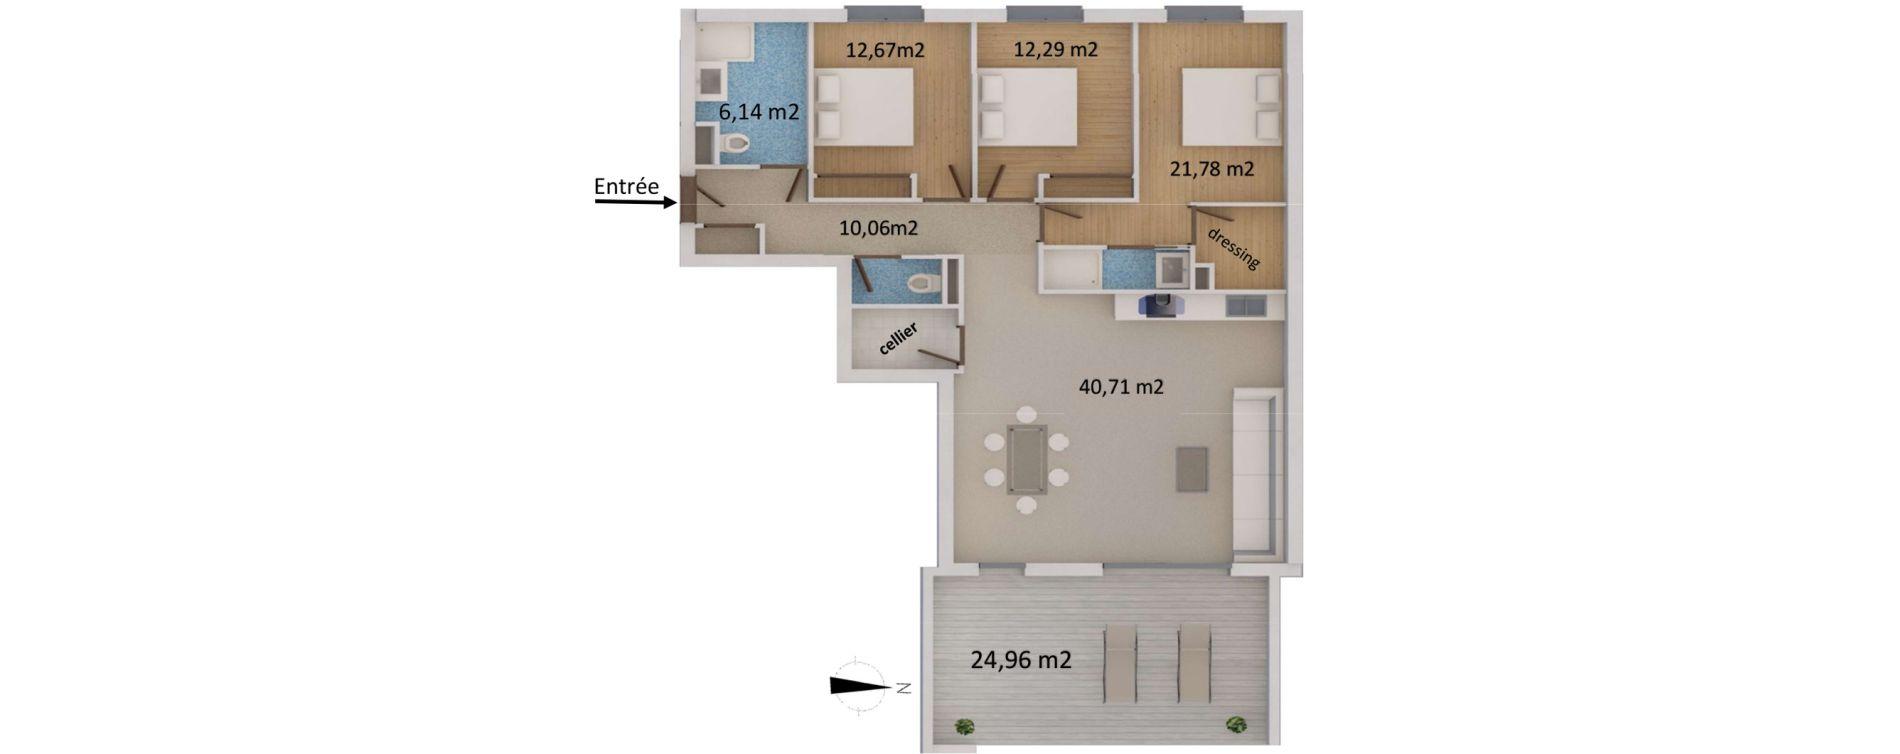 Appartement T4 de 108,32 m2 à San-Martino-Di-Lota Centre